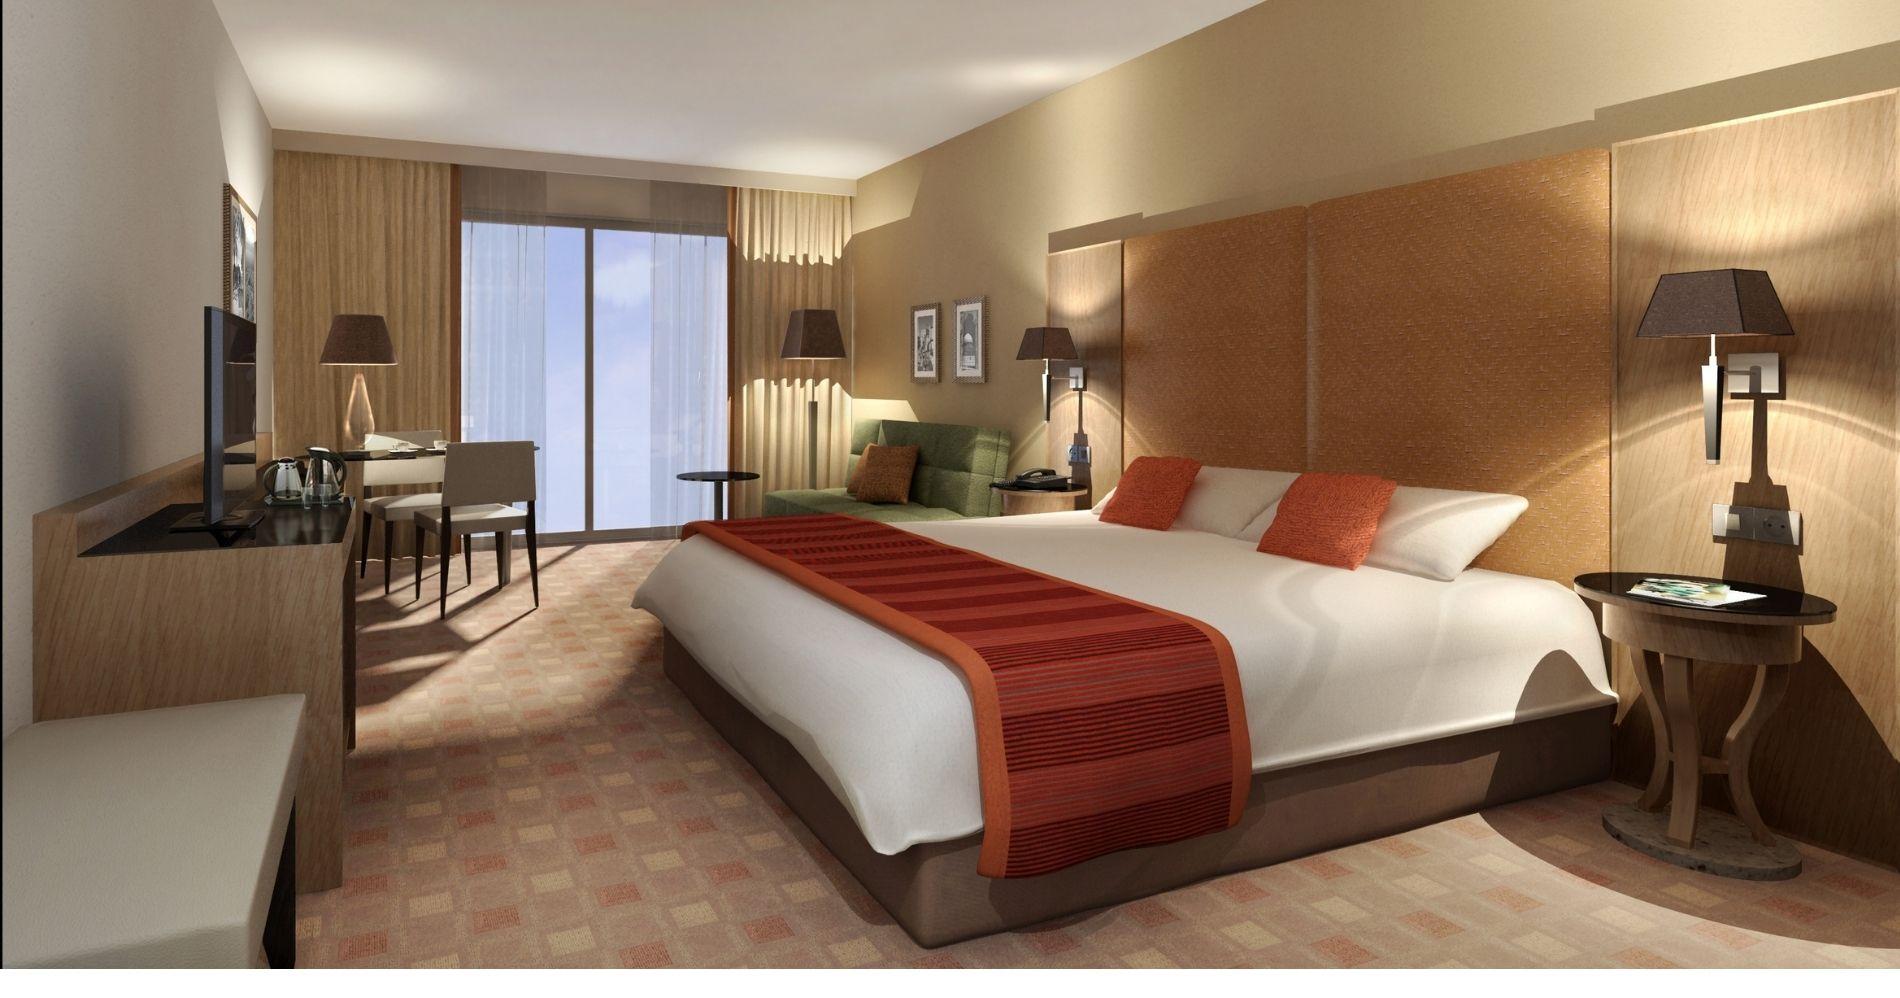 Ilustrasi Gambar Kamar Hotel Berbintang (Canva.com)